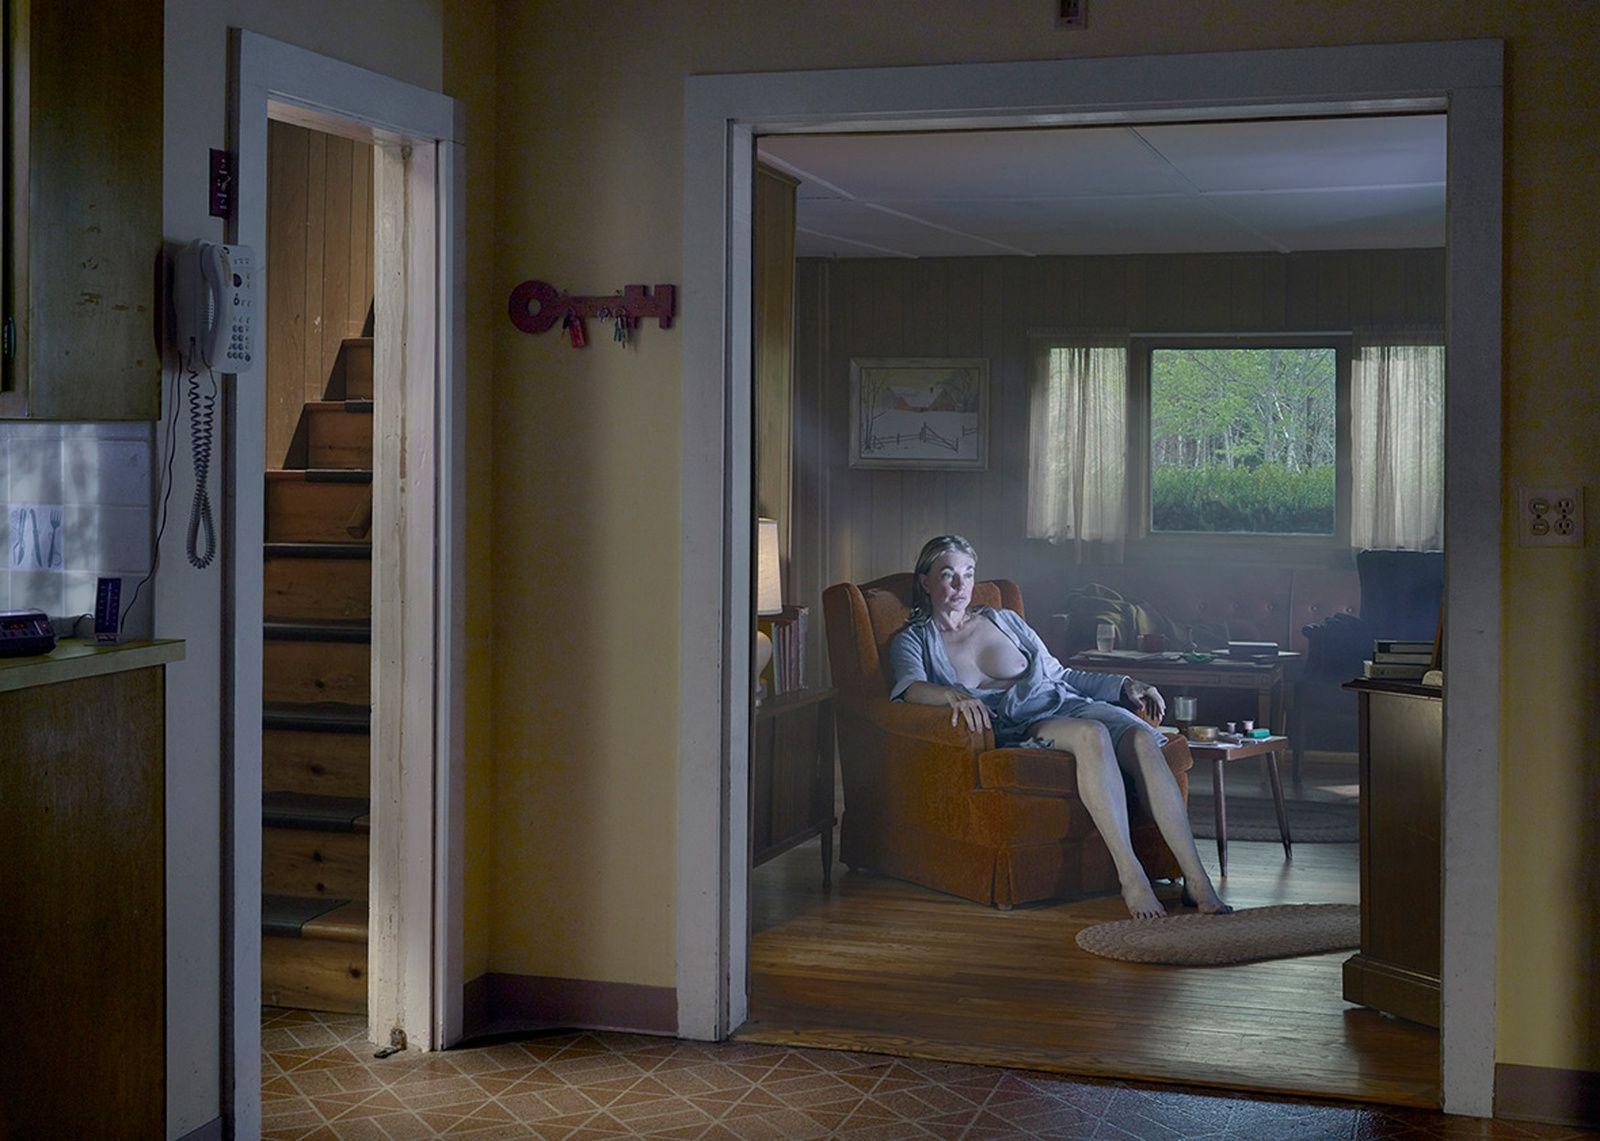 """Living room"", 2014 de Gregory CREWDSON - Courtesy Galerie Templon © Photo Éric Simon"